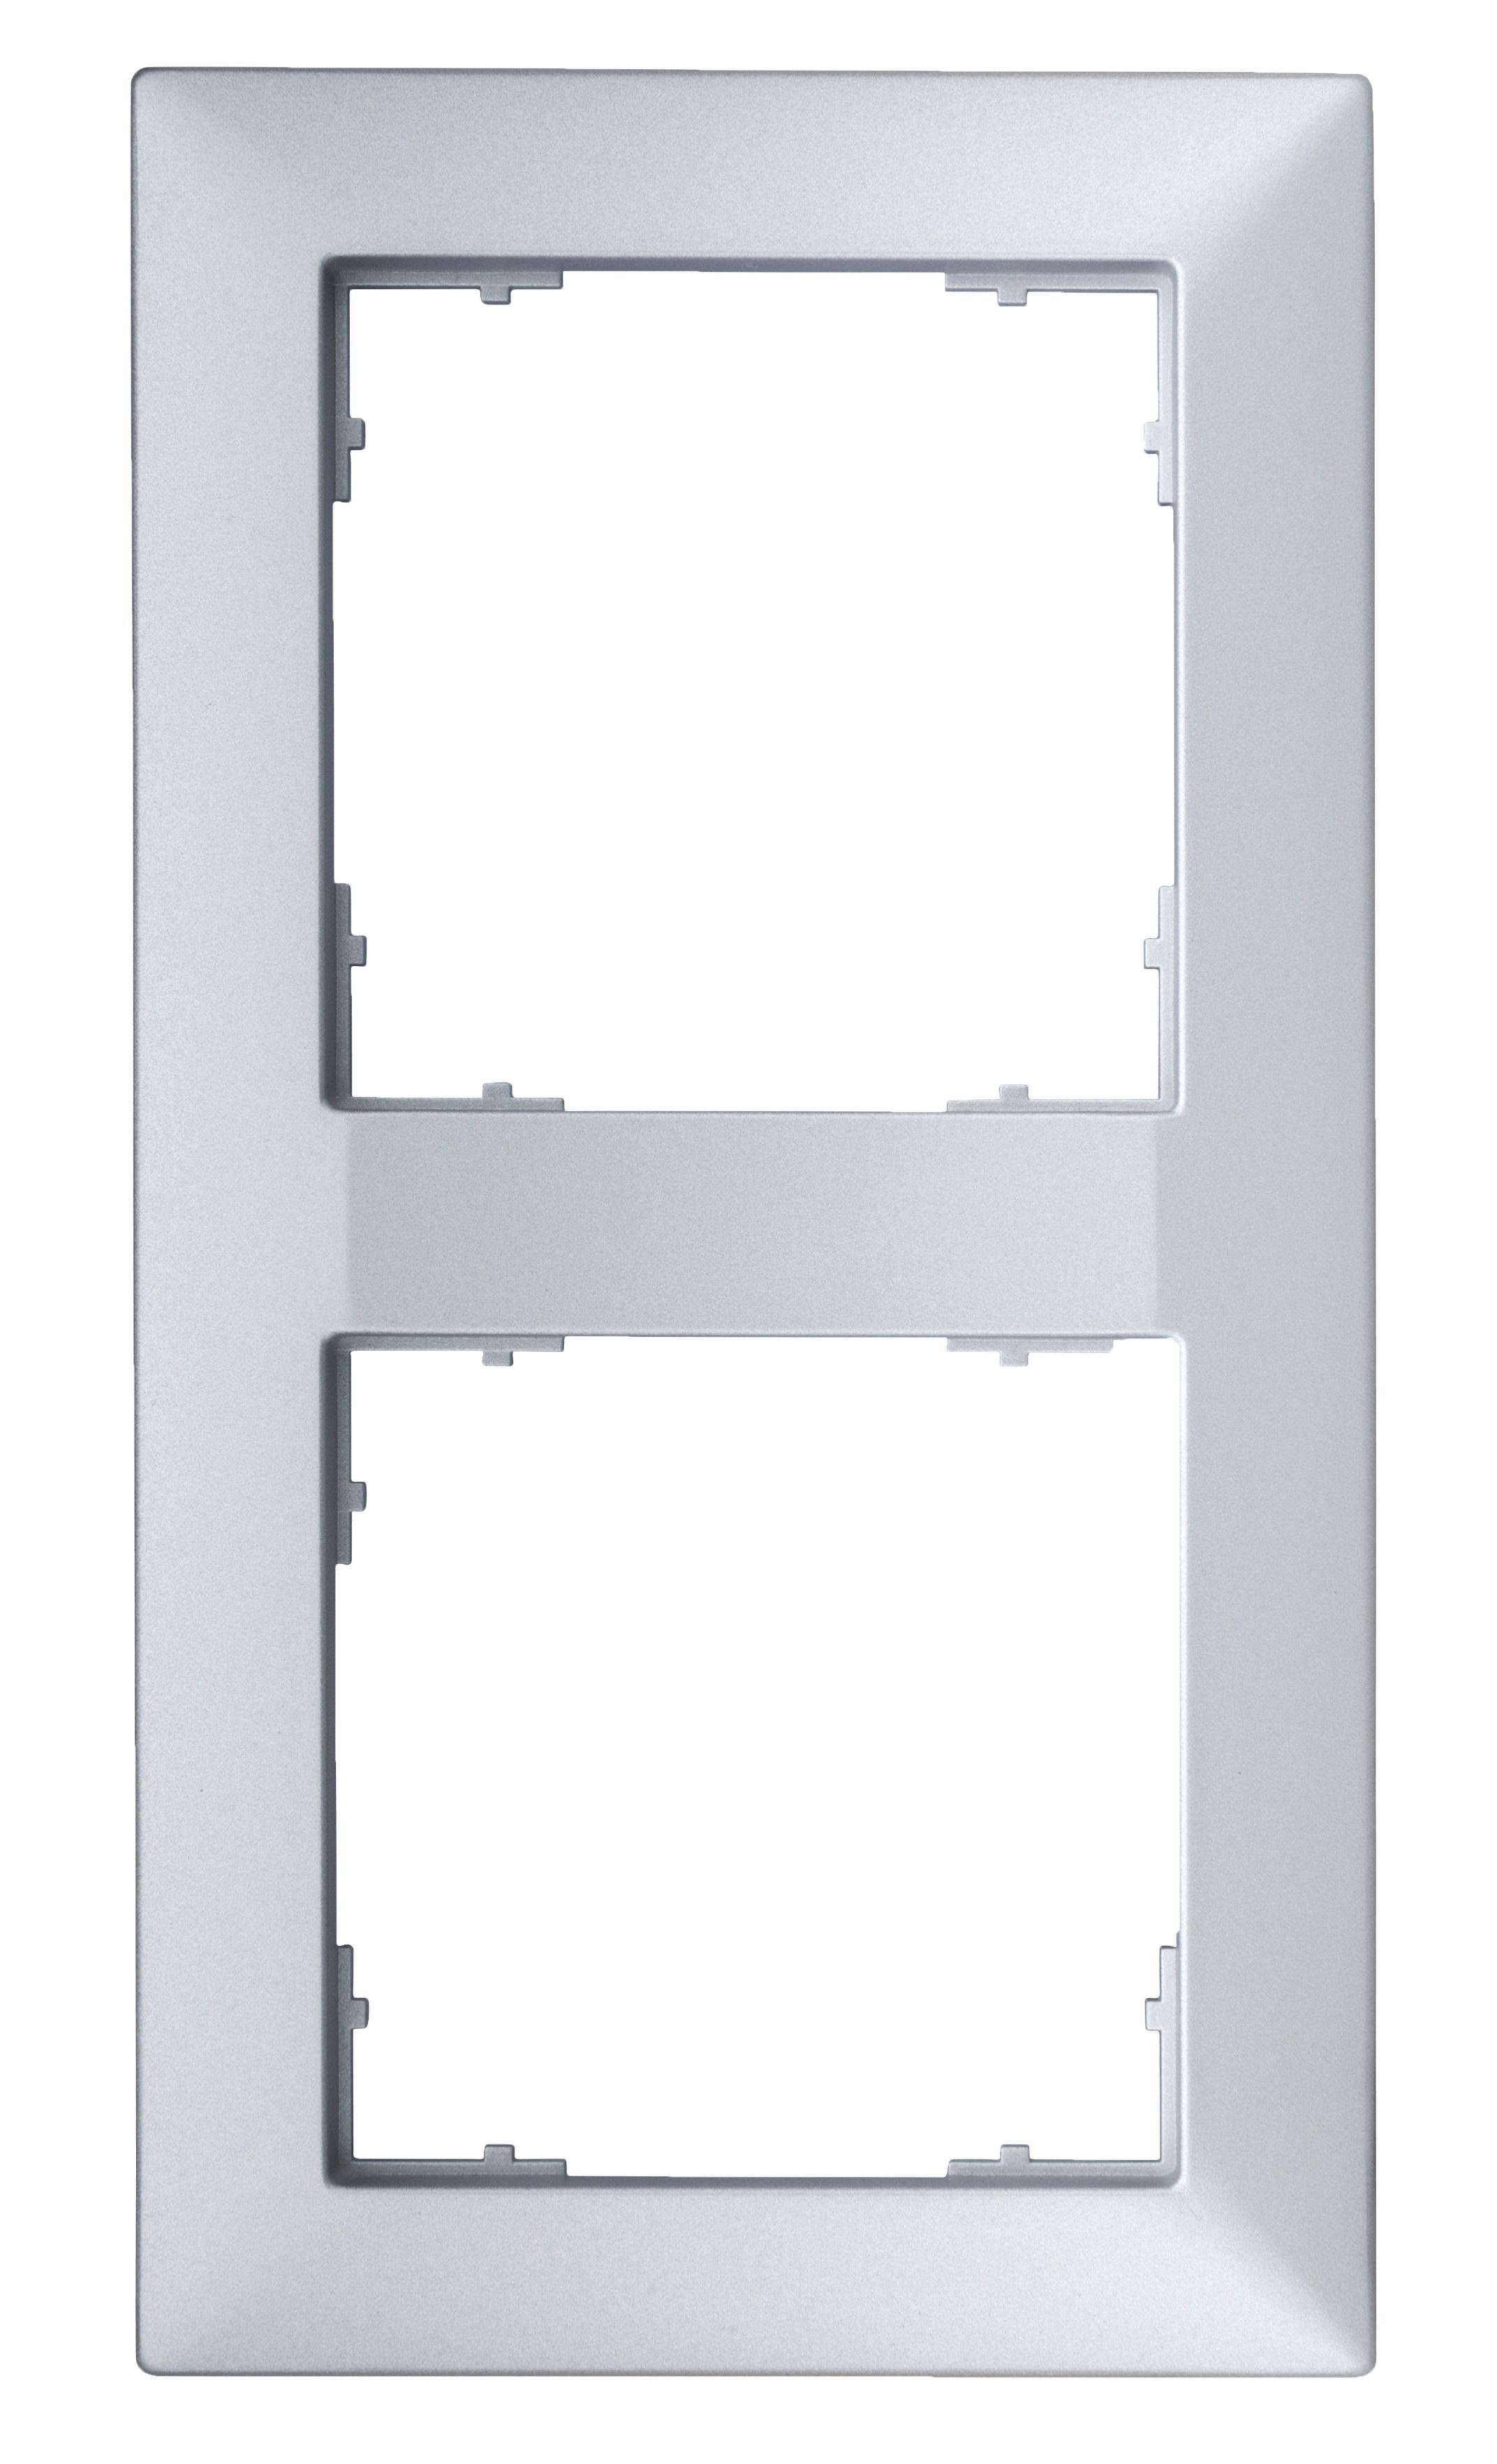 1 Stk Rahmen 55x55mm, 2-fach, Silber EV125022--